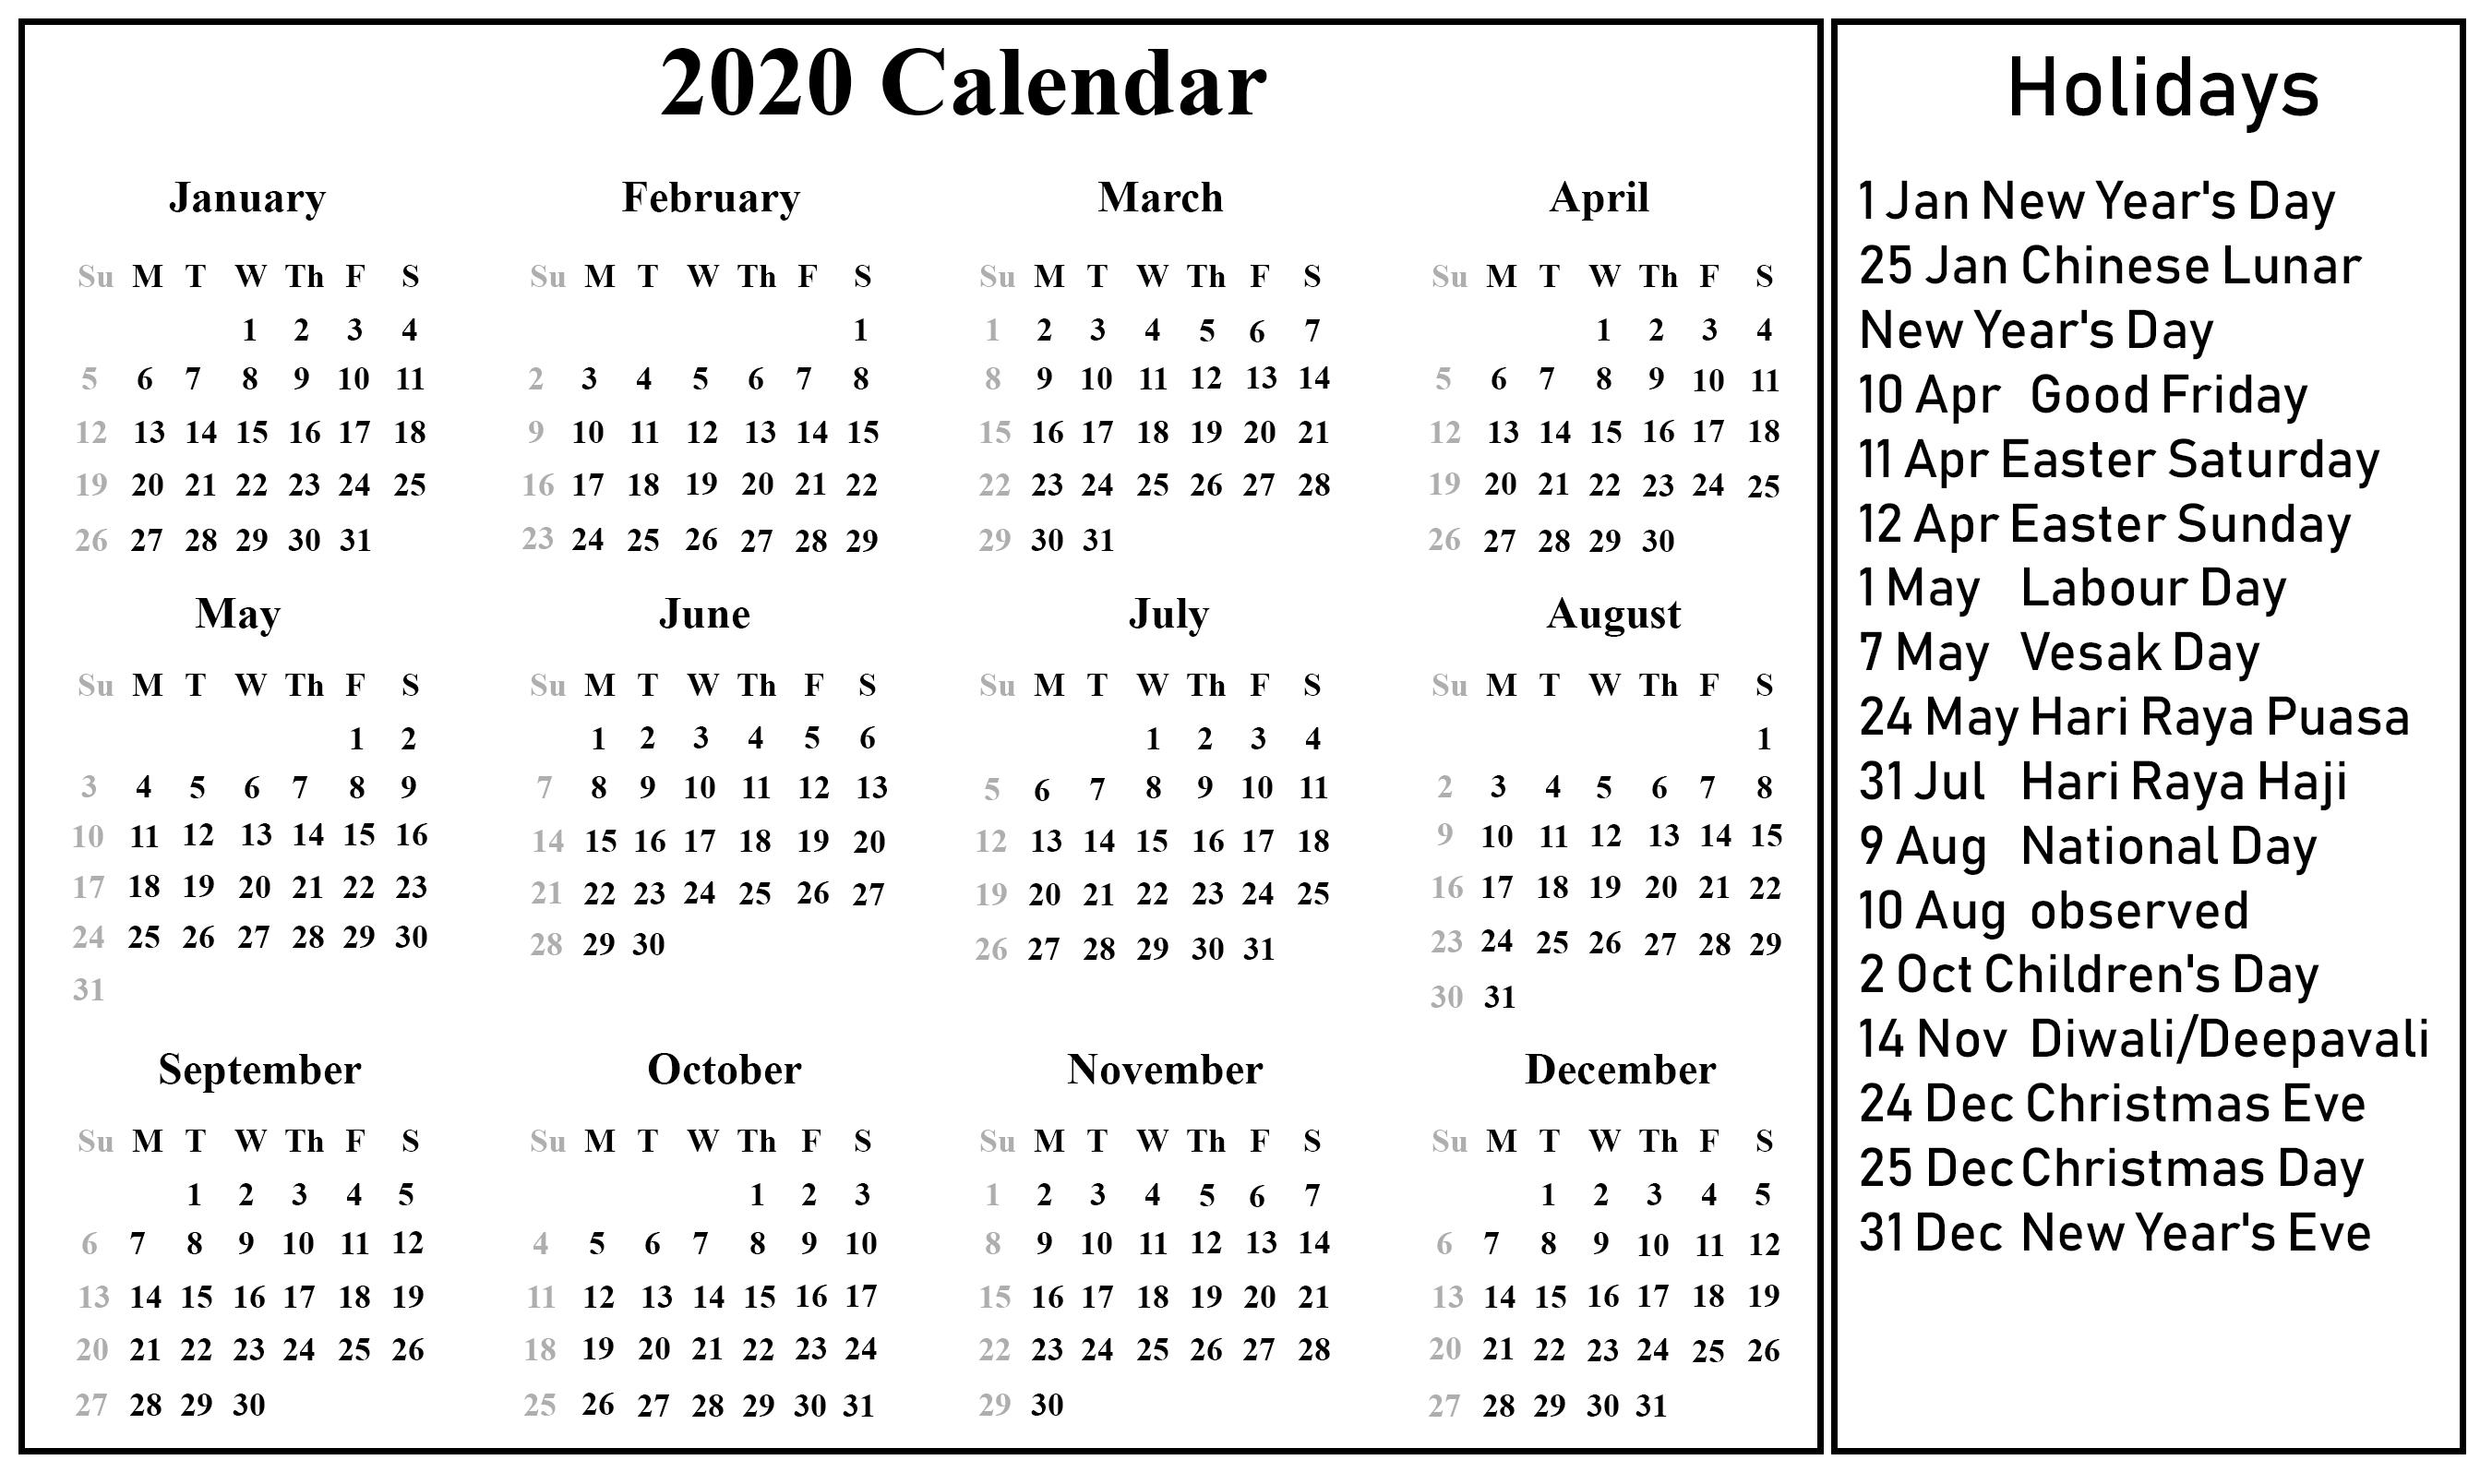 Free Download Singapore Calendar 2020 {Pdf, Excel & Word-2020 Calendar With Public Holidays